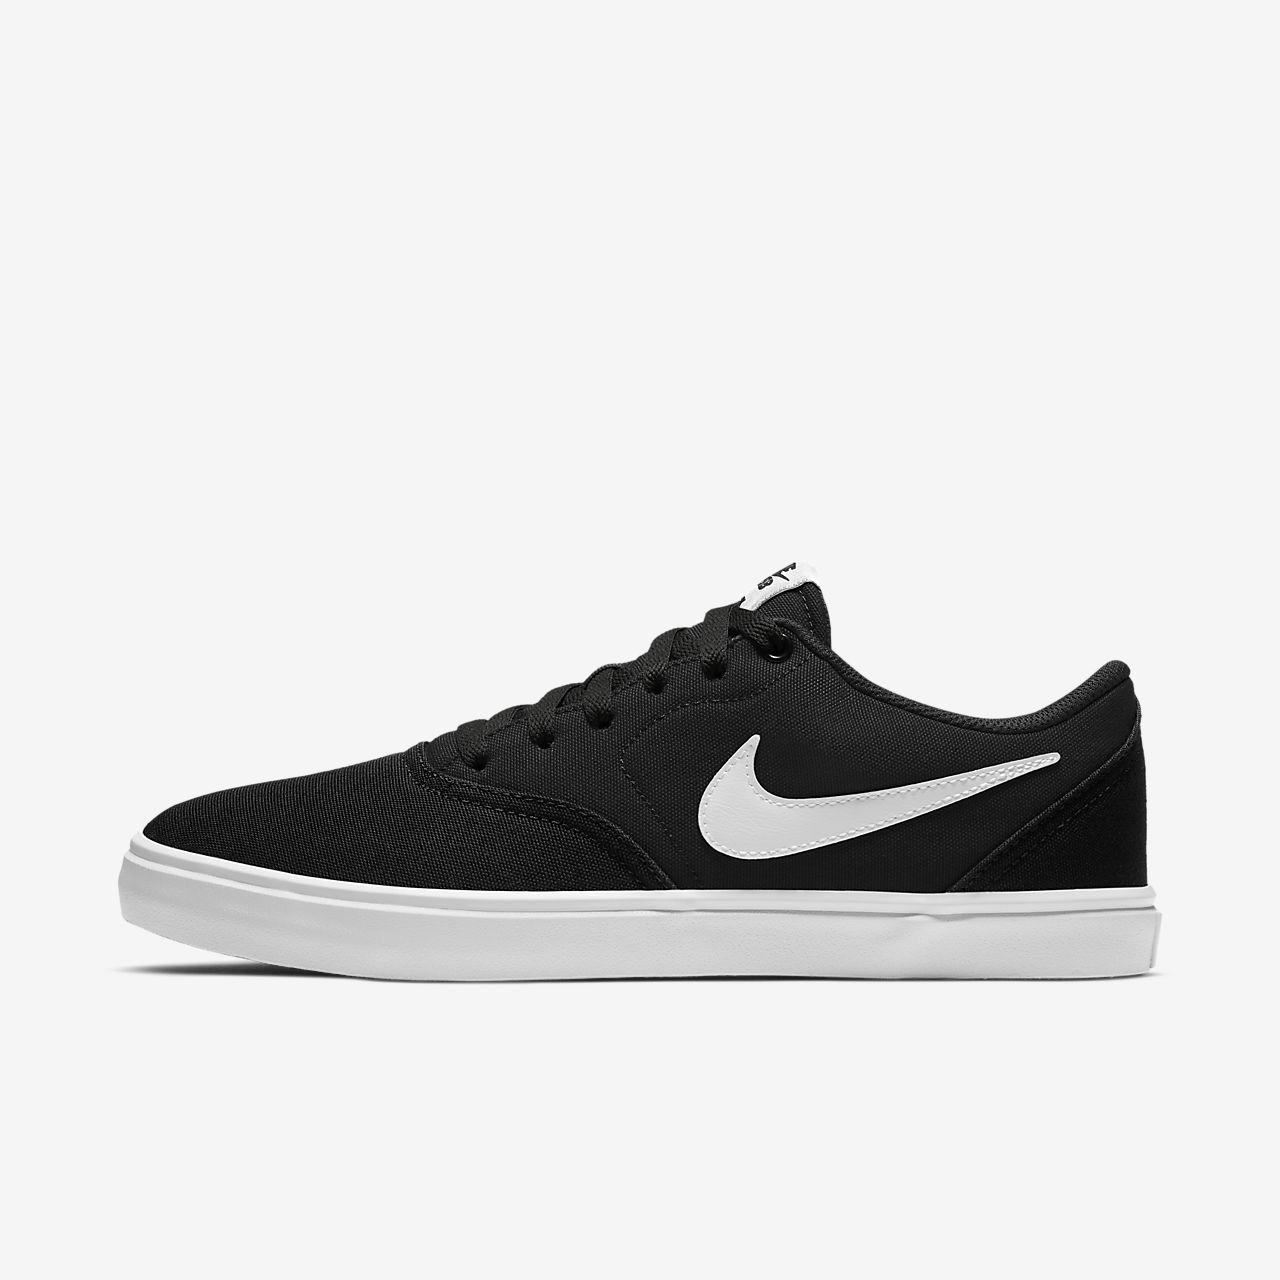 Nike SB Check Solarsoft Canvas Men's Skateboarding Shoes Black/White